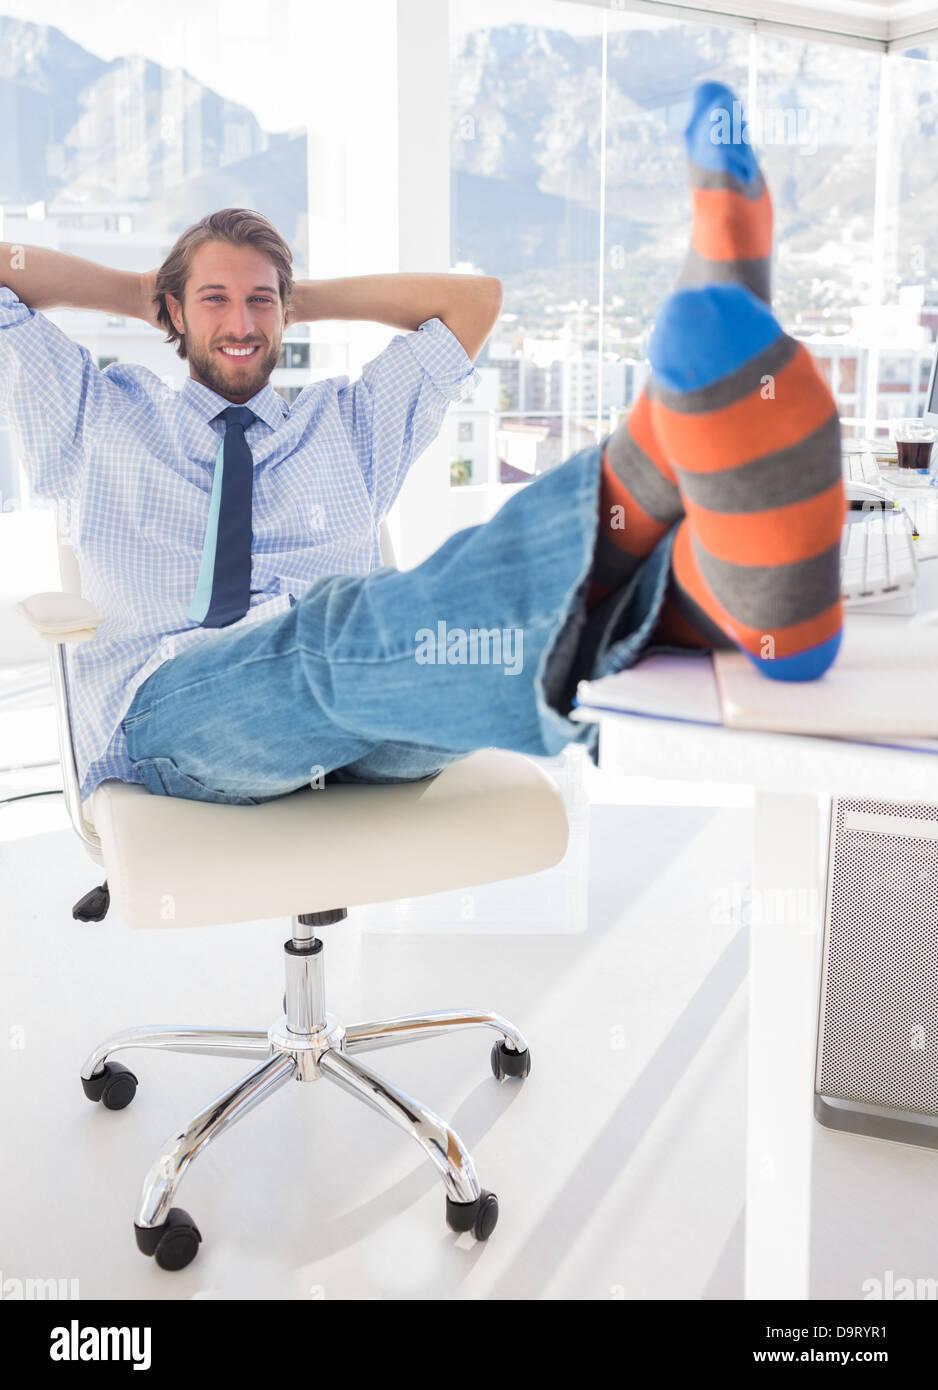 Shoeless designer kicking back - Stock Image